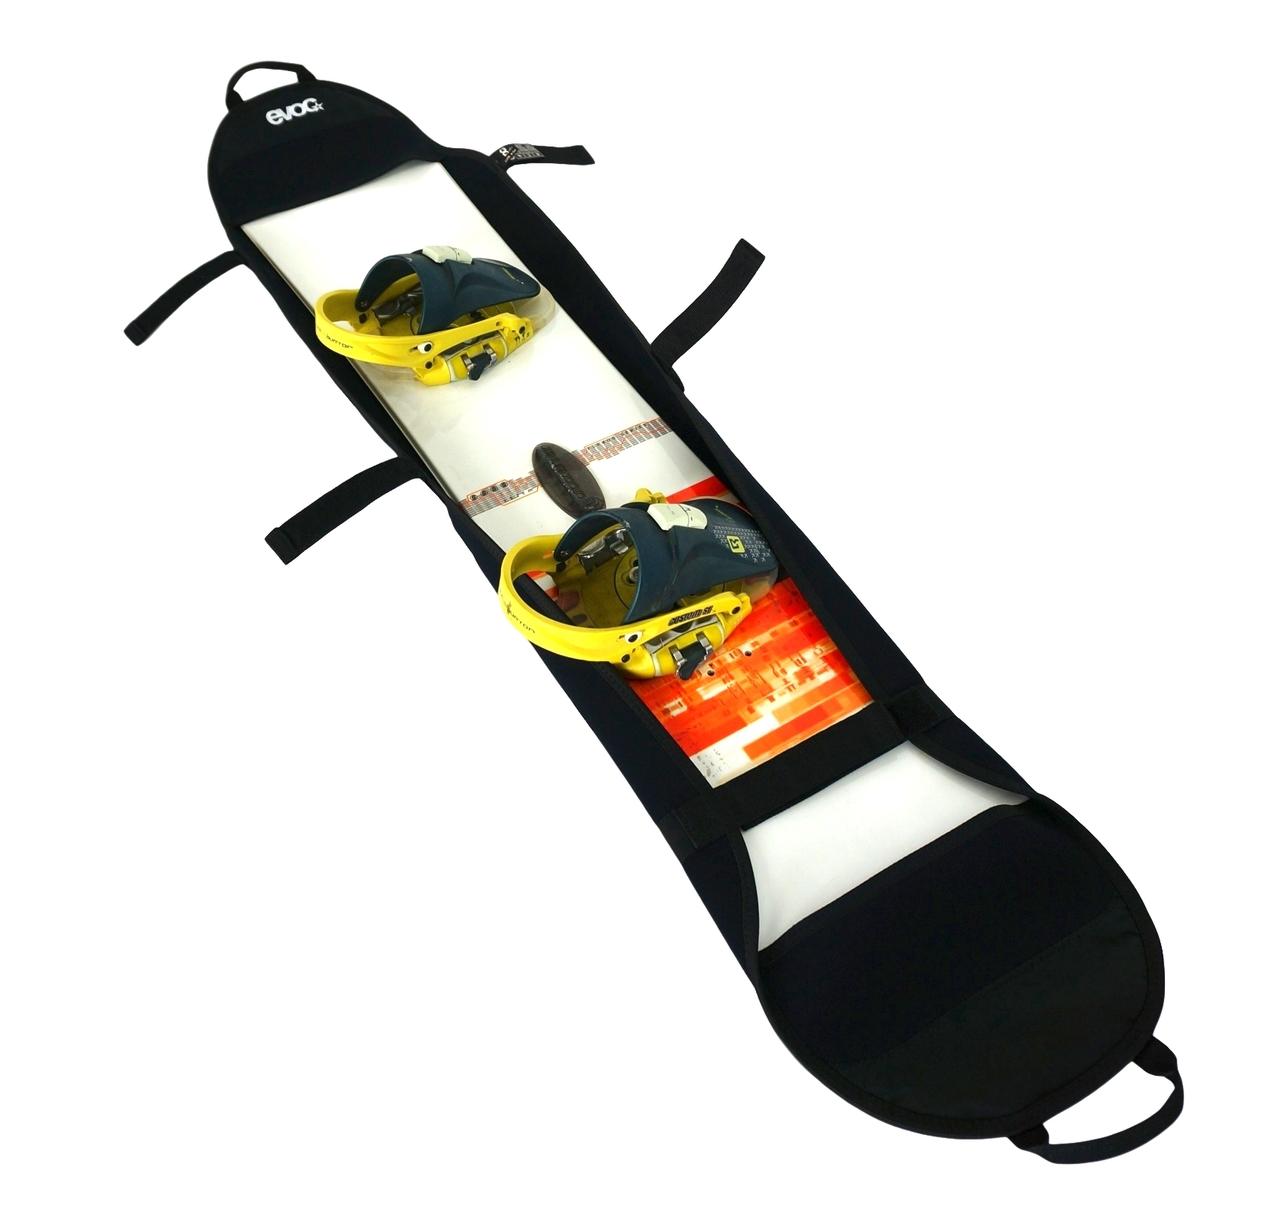 3691b2d1f7e EVOC Neoprene Snowboard Cover - StoreYourBoard.com